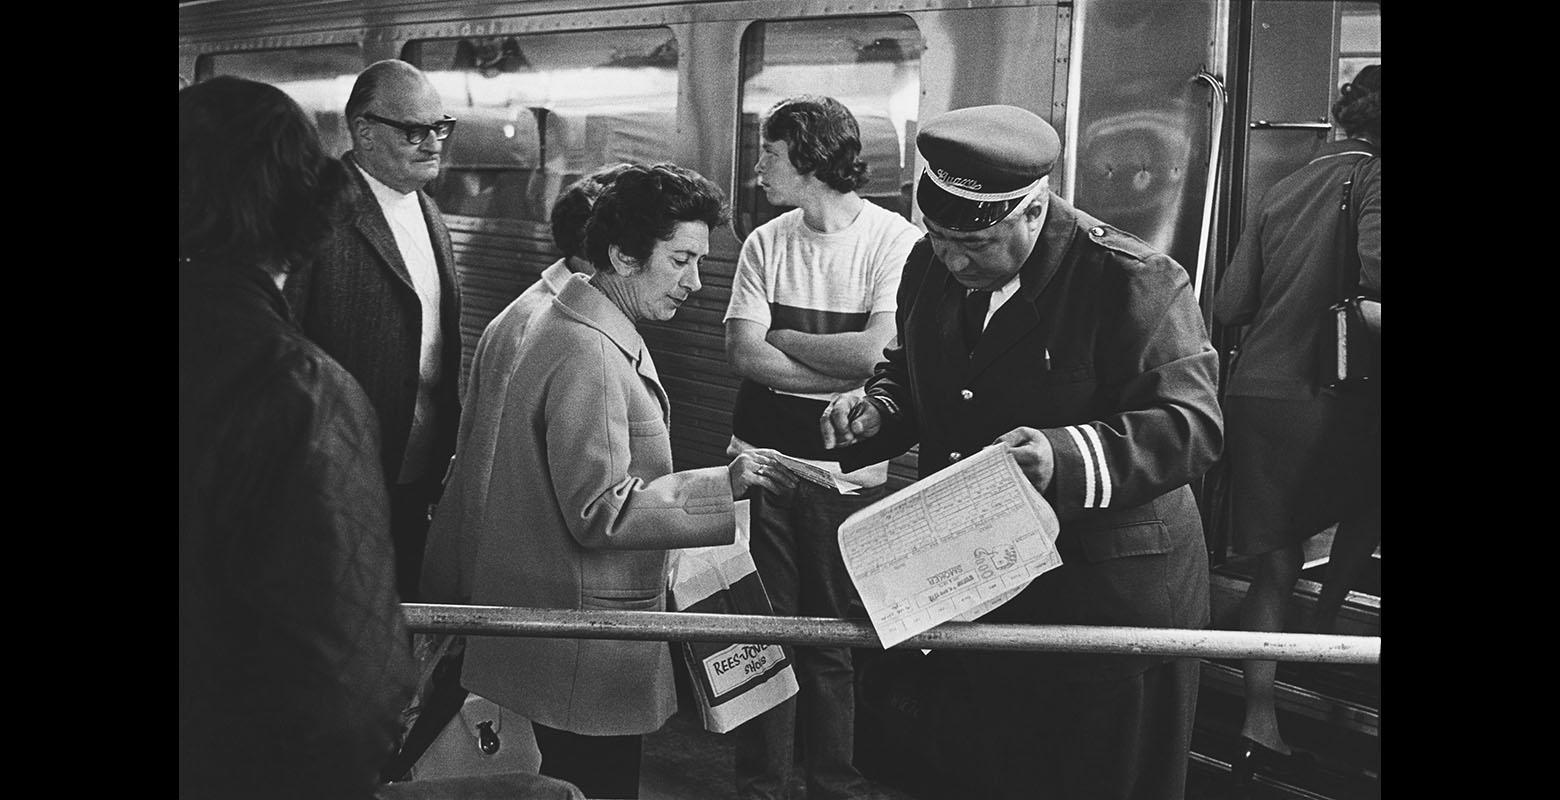 A man checks a ticket of a woman at a train station